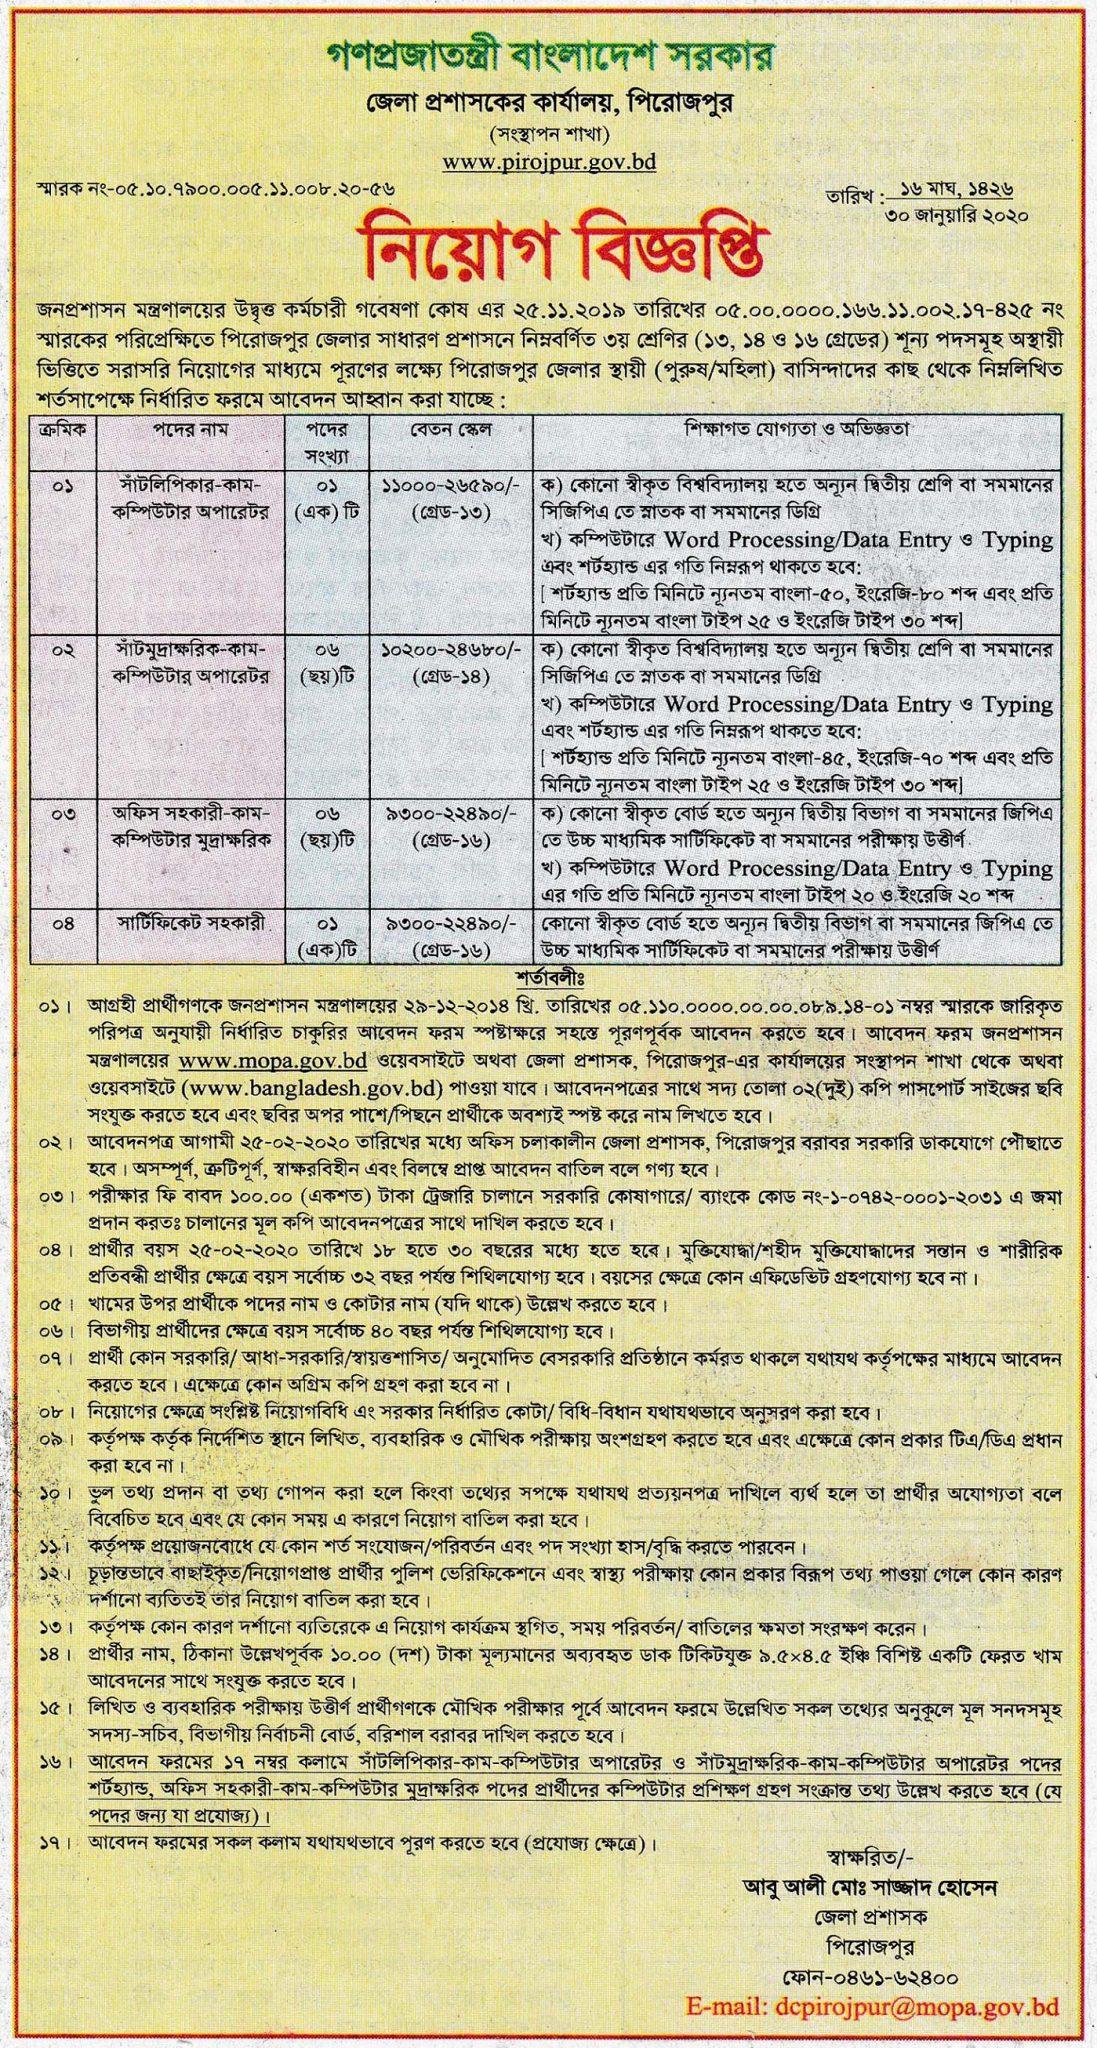 Pirojpur Deputy Commissioner's Office Job Circular 2020